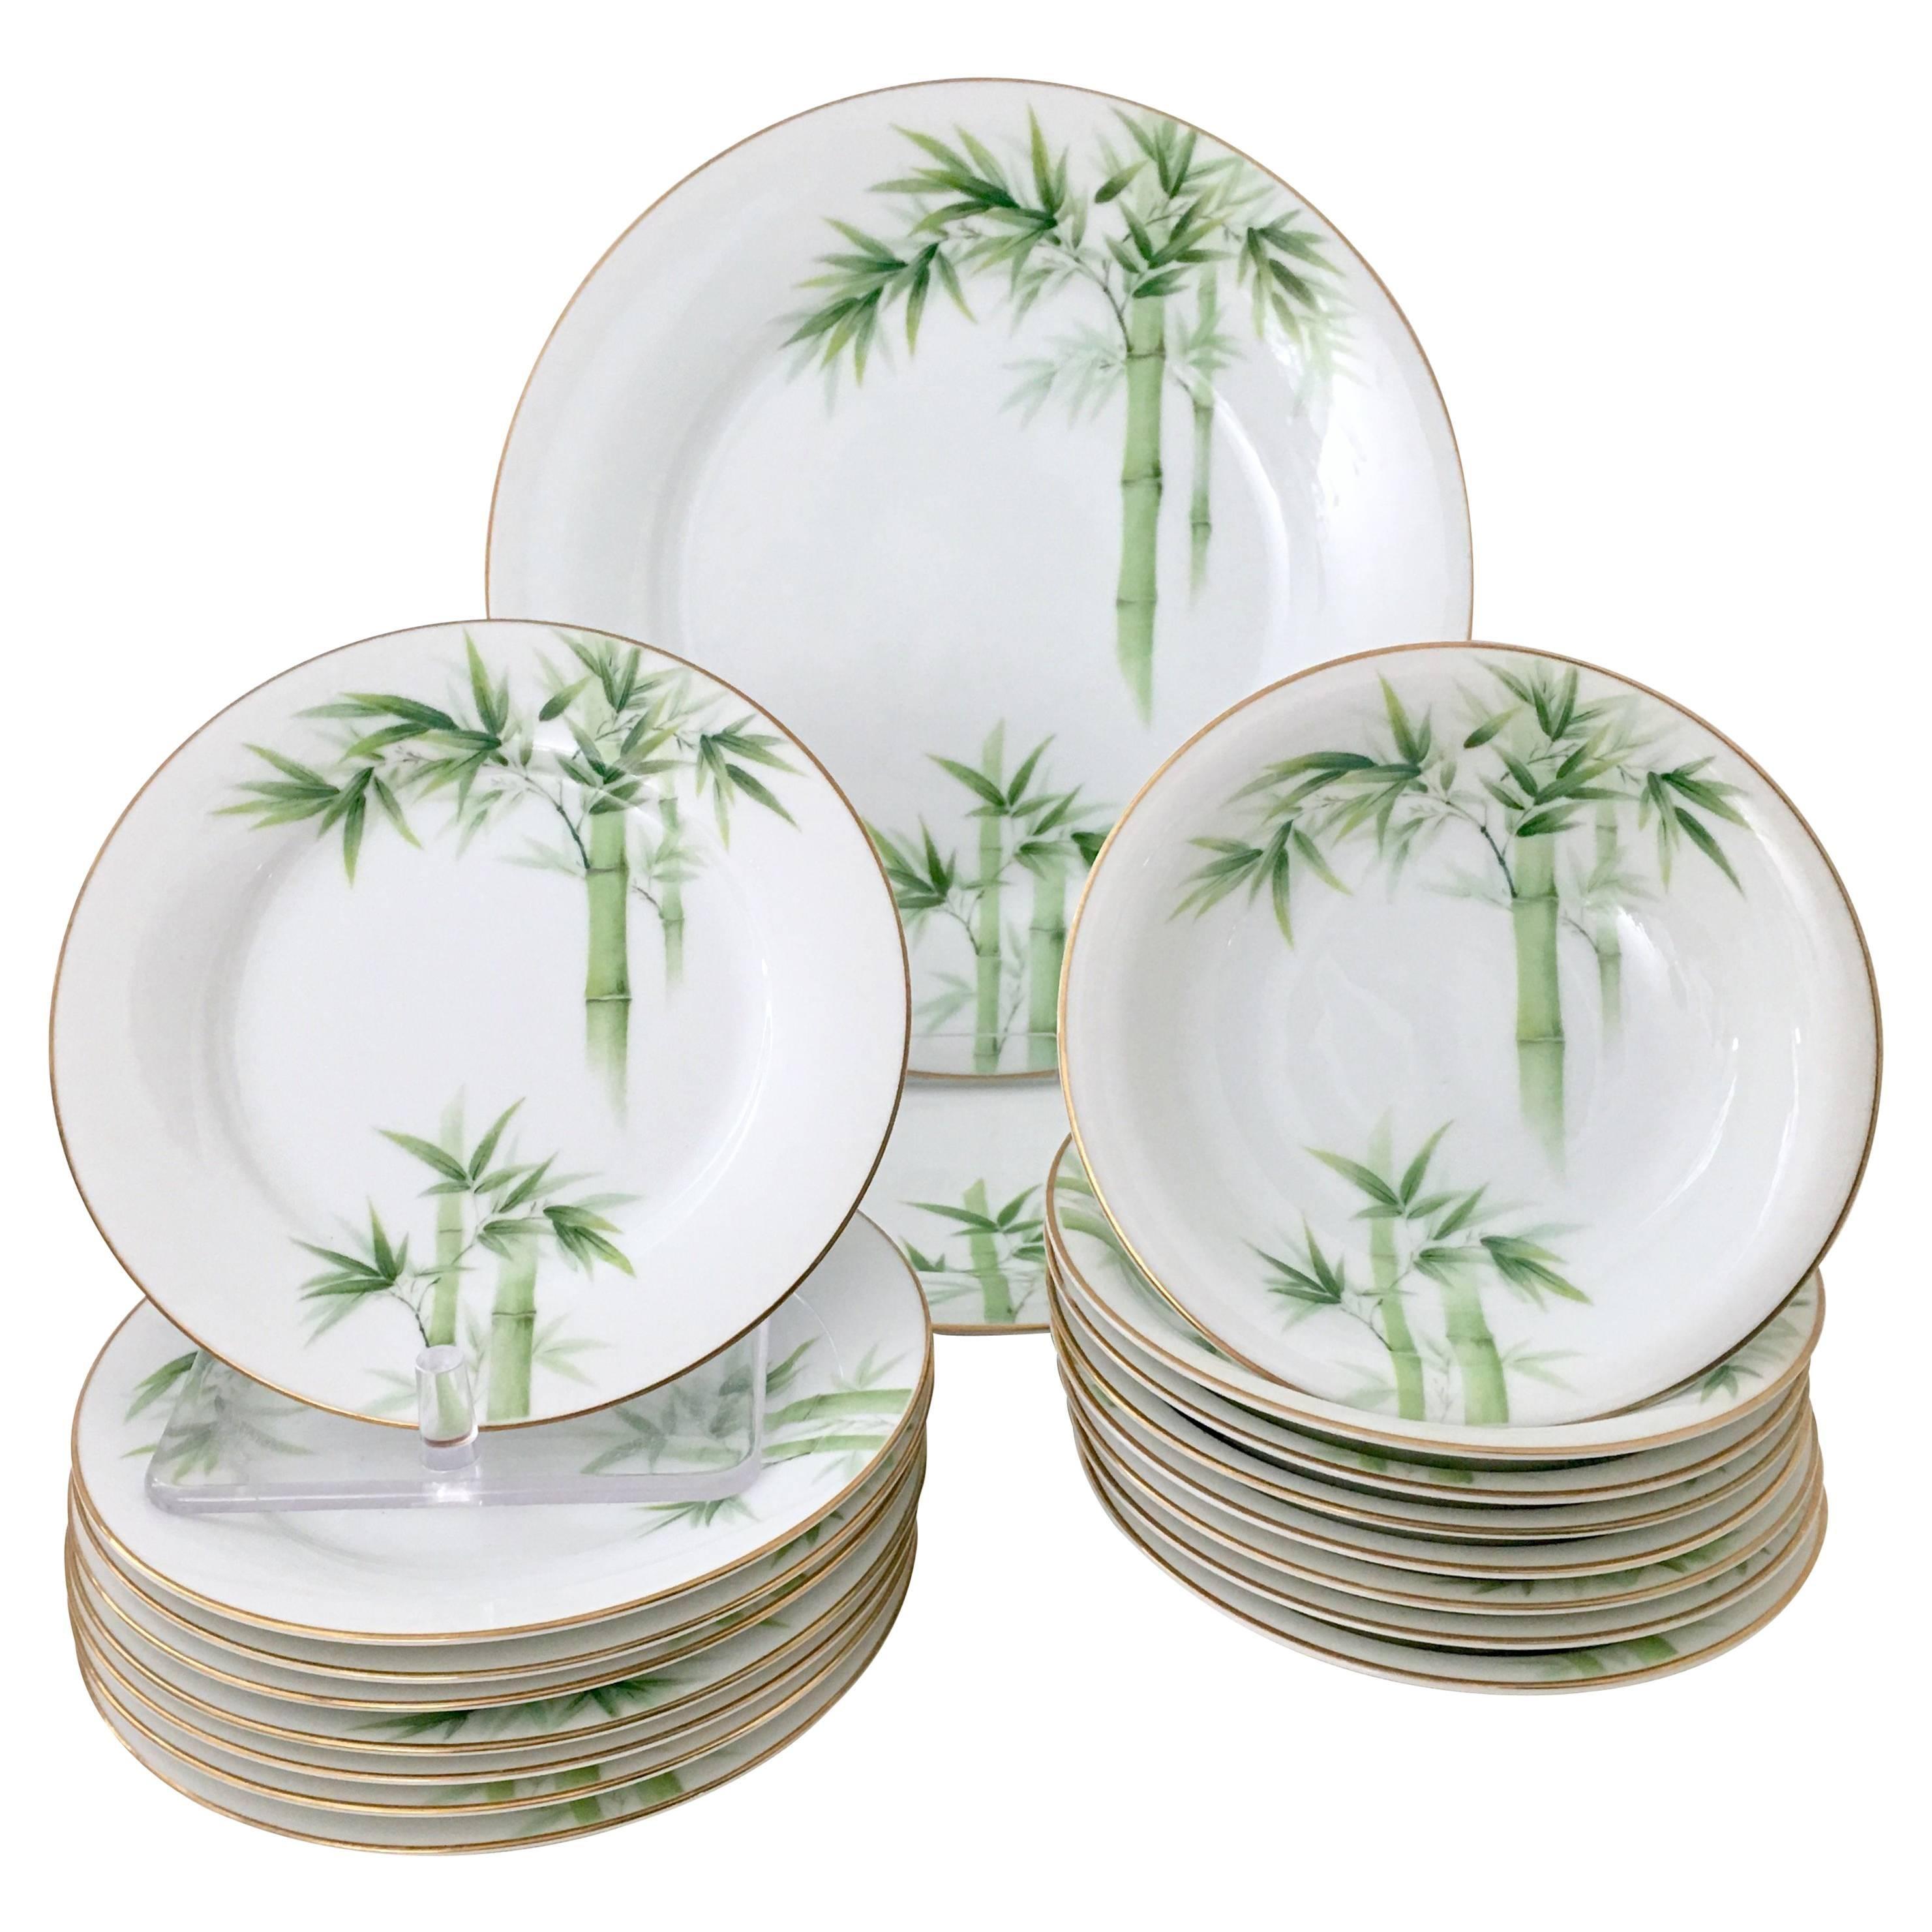 Vintage Japanese Nippon Bamboo Dinnerware Set of 18 For Sale  sc 1 st  1stDibs & Vintage Japanese Nippon Bamboo Dinnerware Set of 18 at 1stdibs